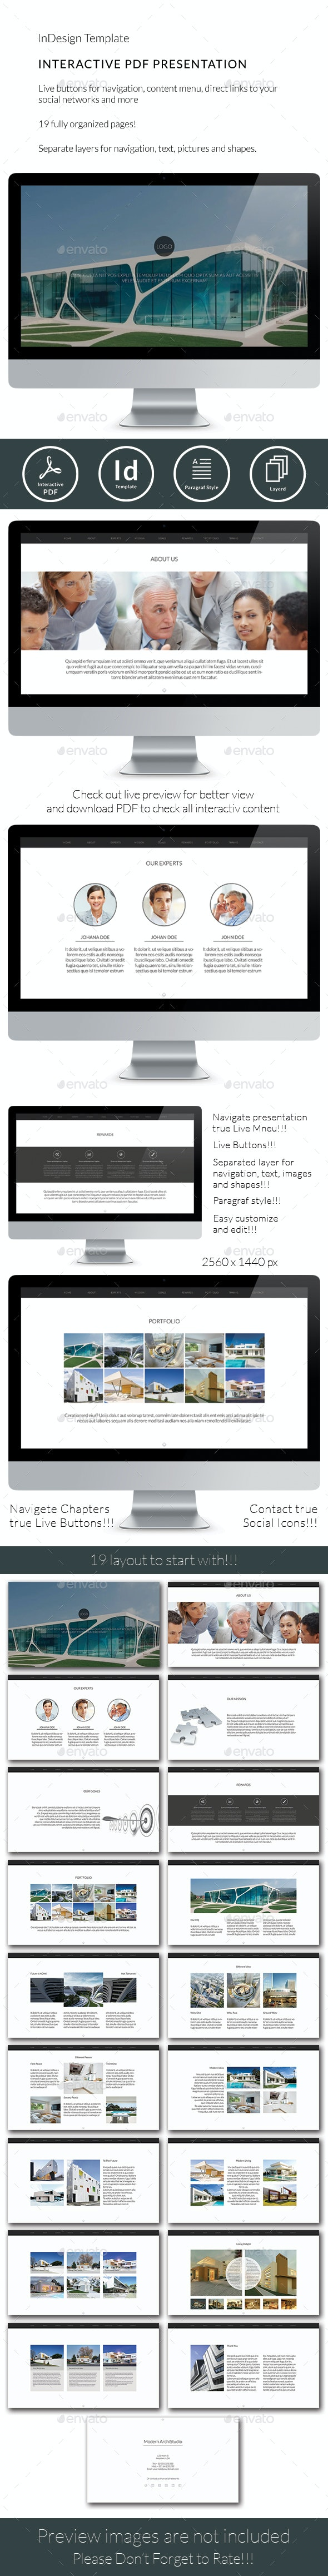 Interactive PDF Prezentation No2 - ePublishing